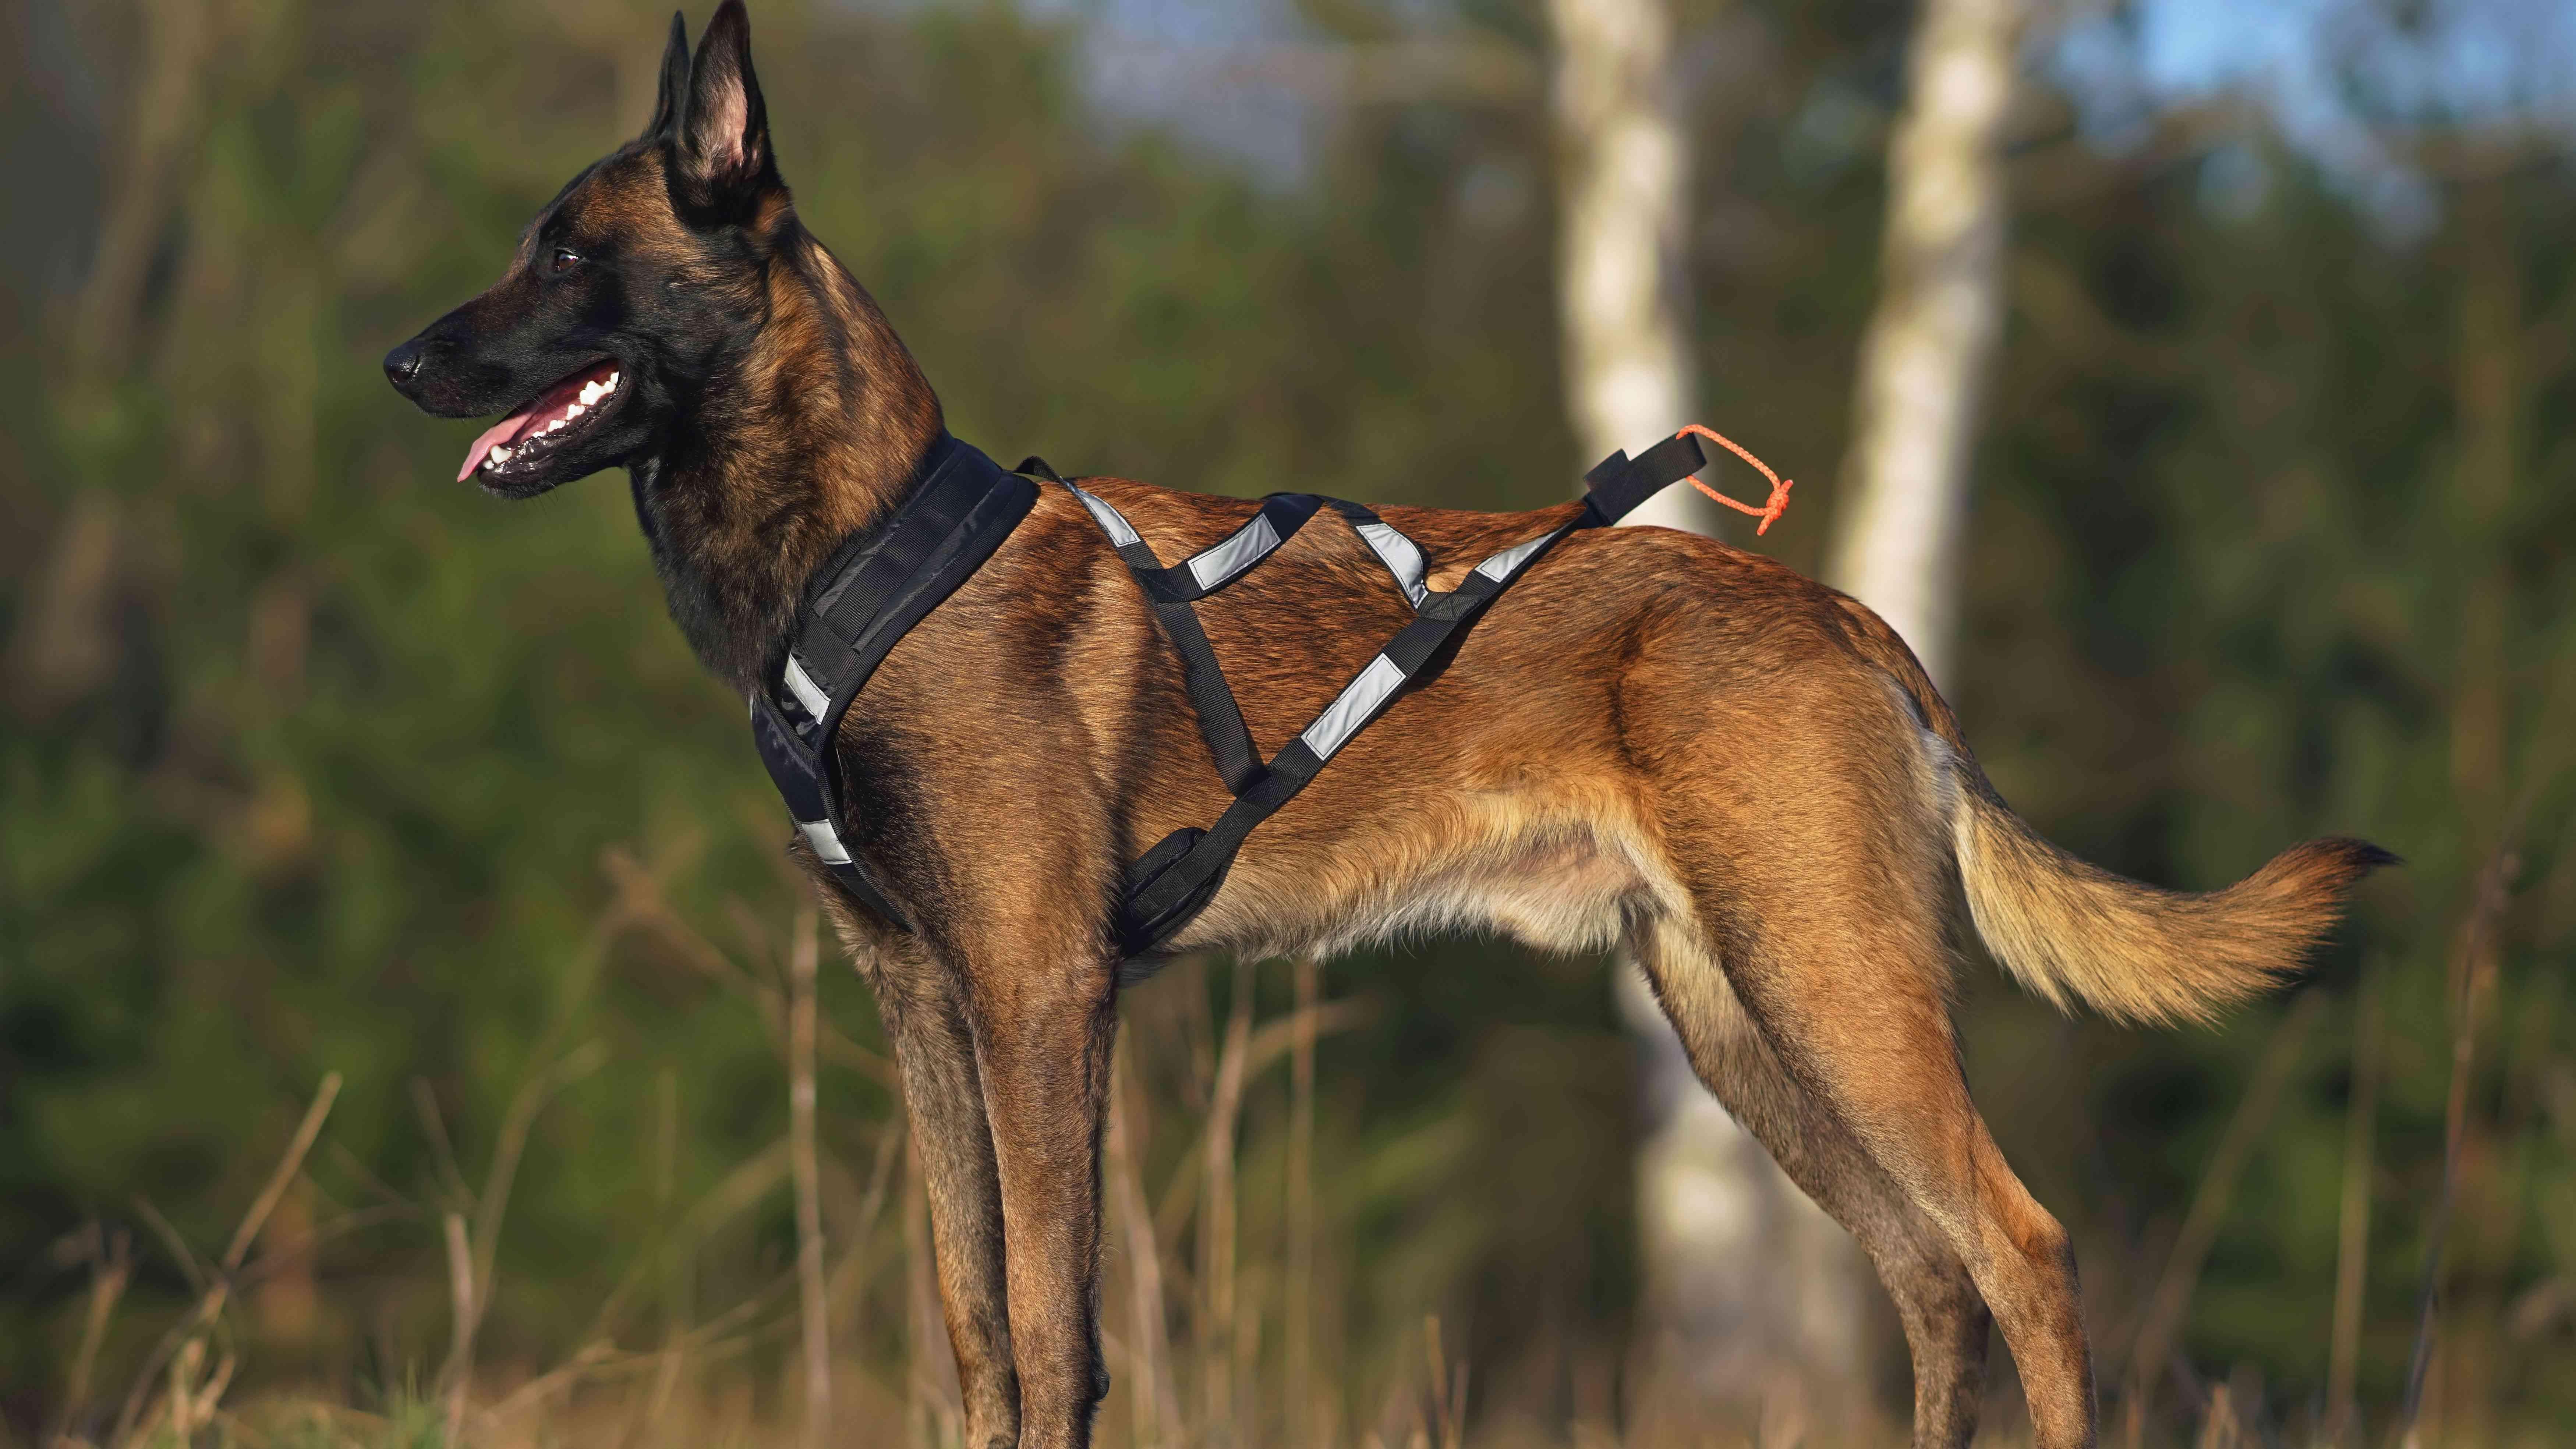 Cómo elegir collar o un arnés para tu perro